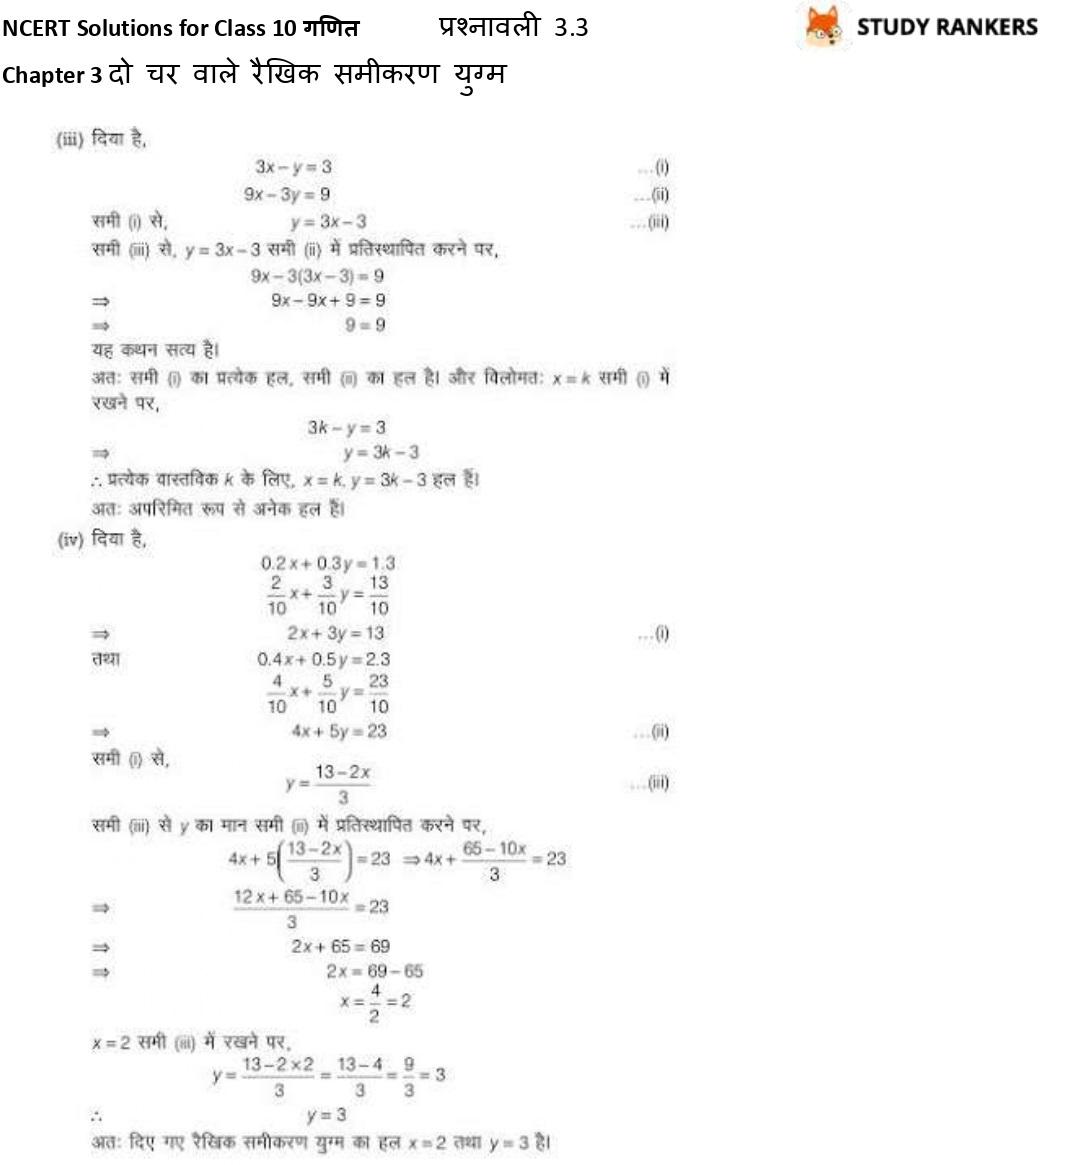 NCERT Solutions for Class 10 Maths Chapter 3 दो चर वाले रैखिक समीकरण युग्म प्रश्नावली 3.3 Part 2